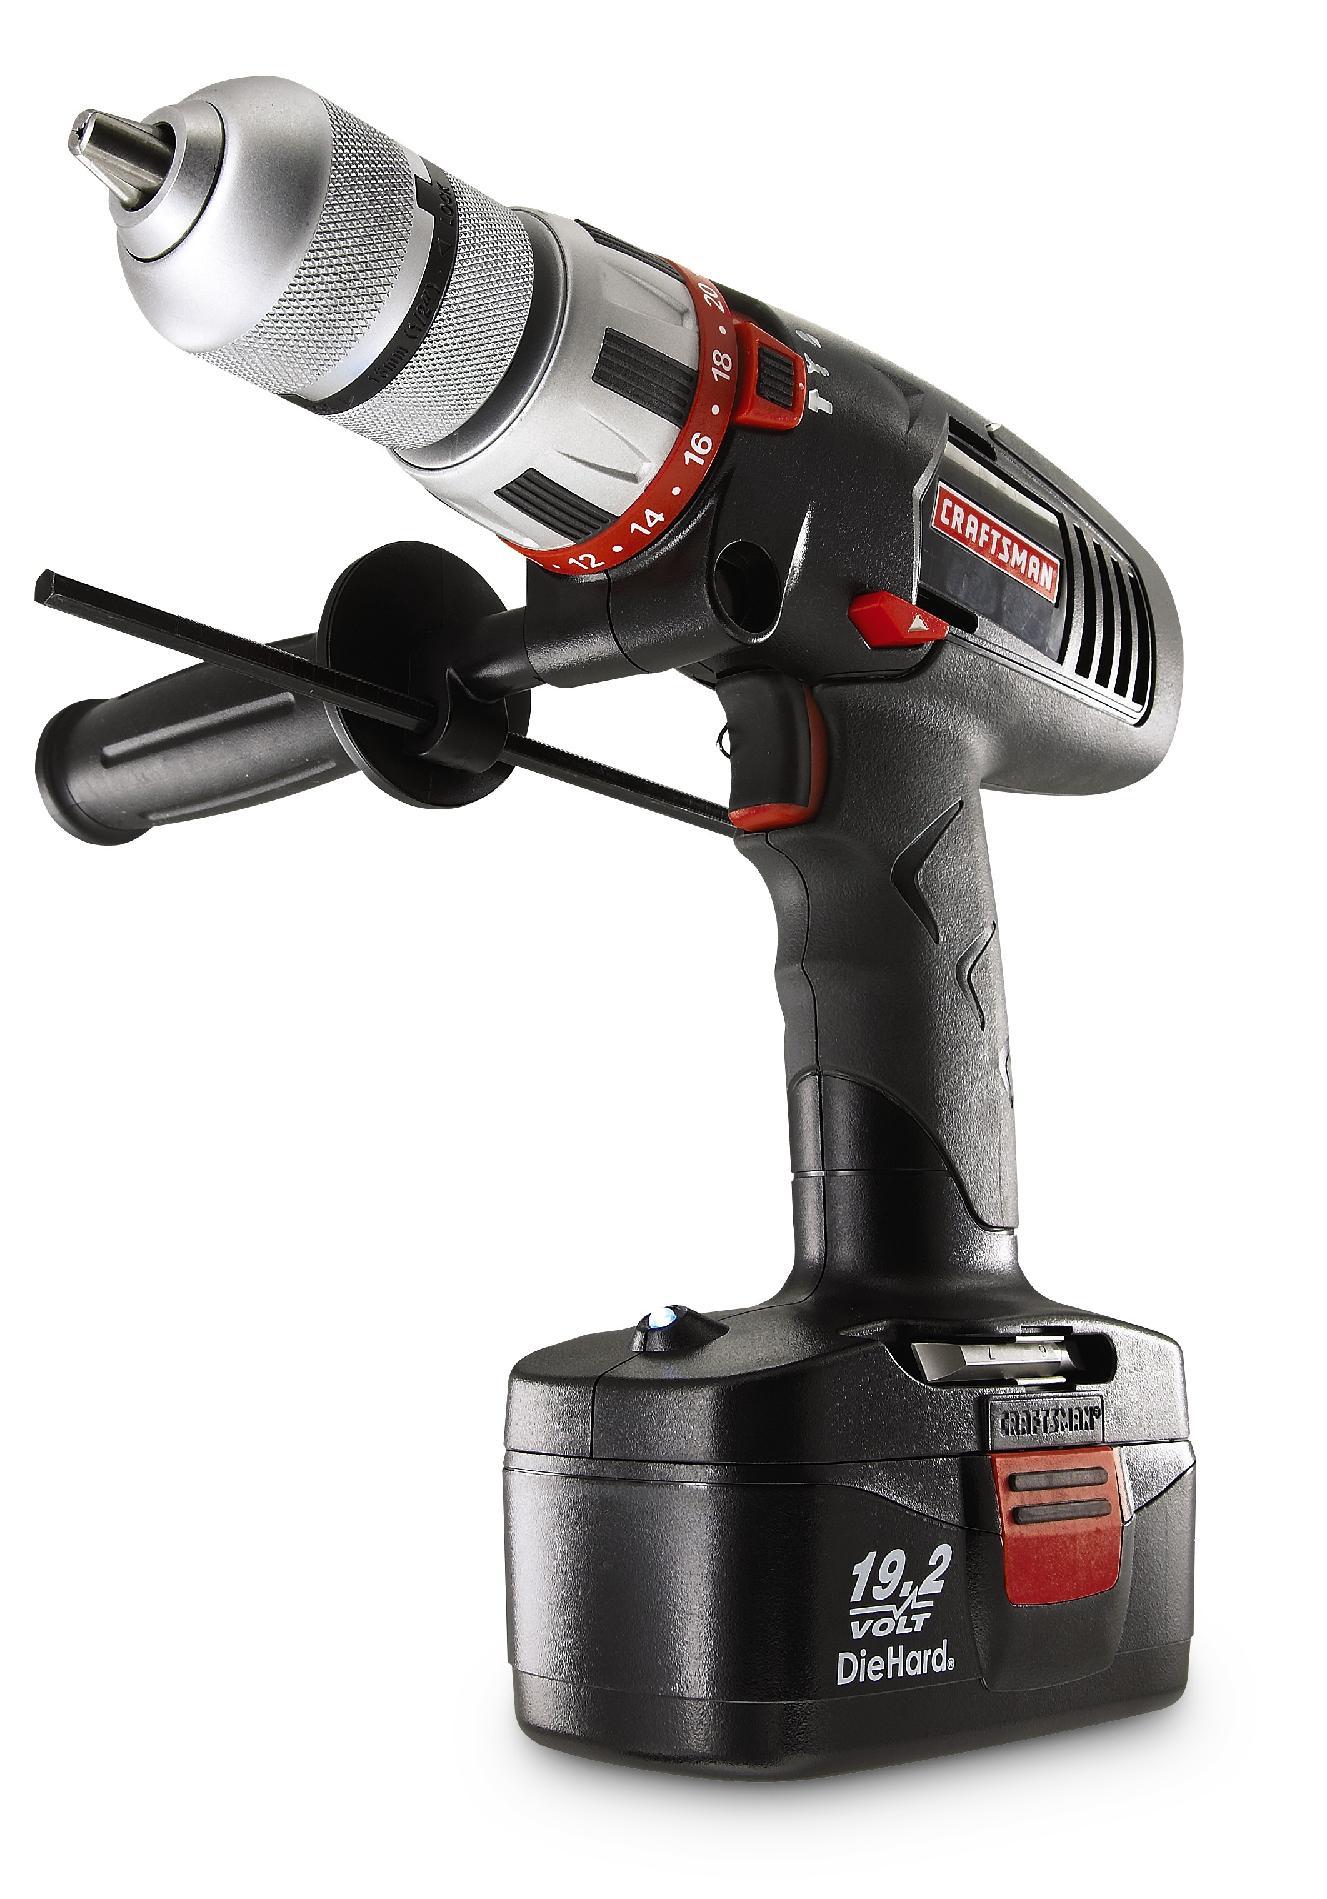 "Craftsman C3 19.2-Volt Cordless 1/2"" Hammer Drill/Driver"